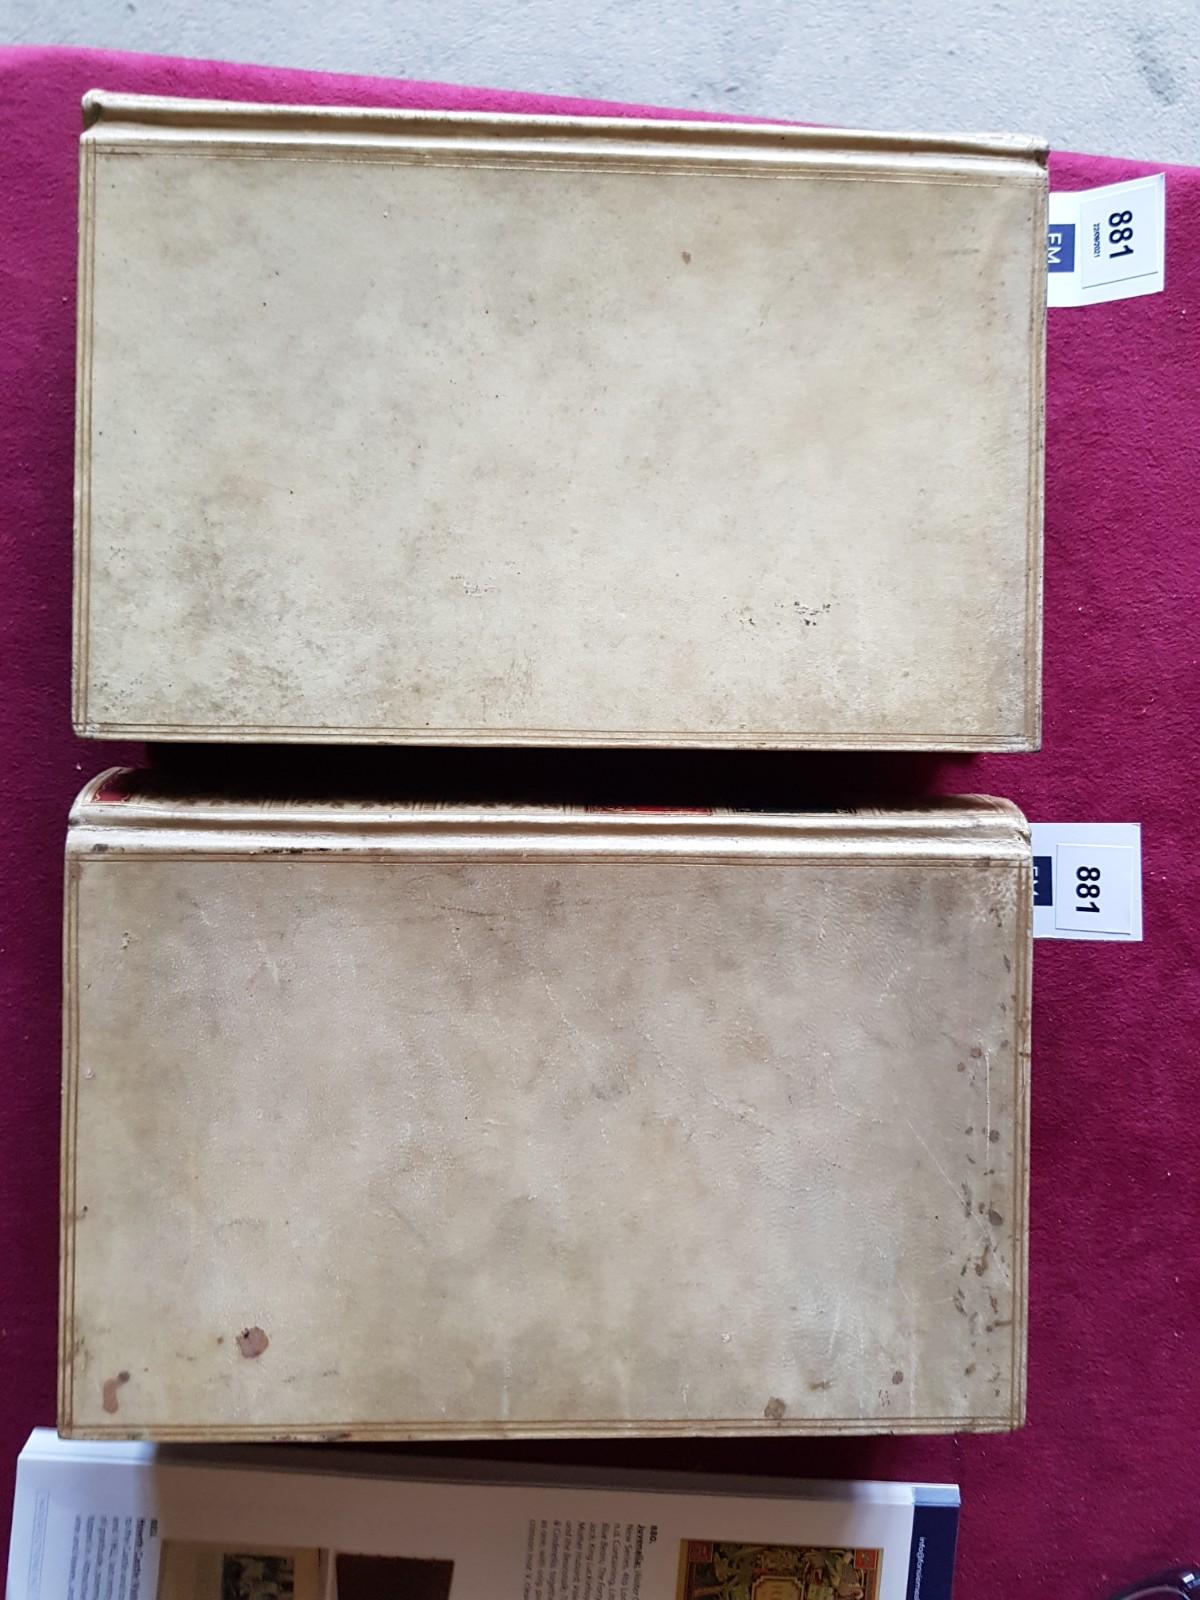 De Stael (Madame)ÿOeuvres Completes de Madame la Baronne de Stael-Holstein, 2 vols. folio Paris ( - Image 8 of 8